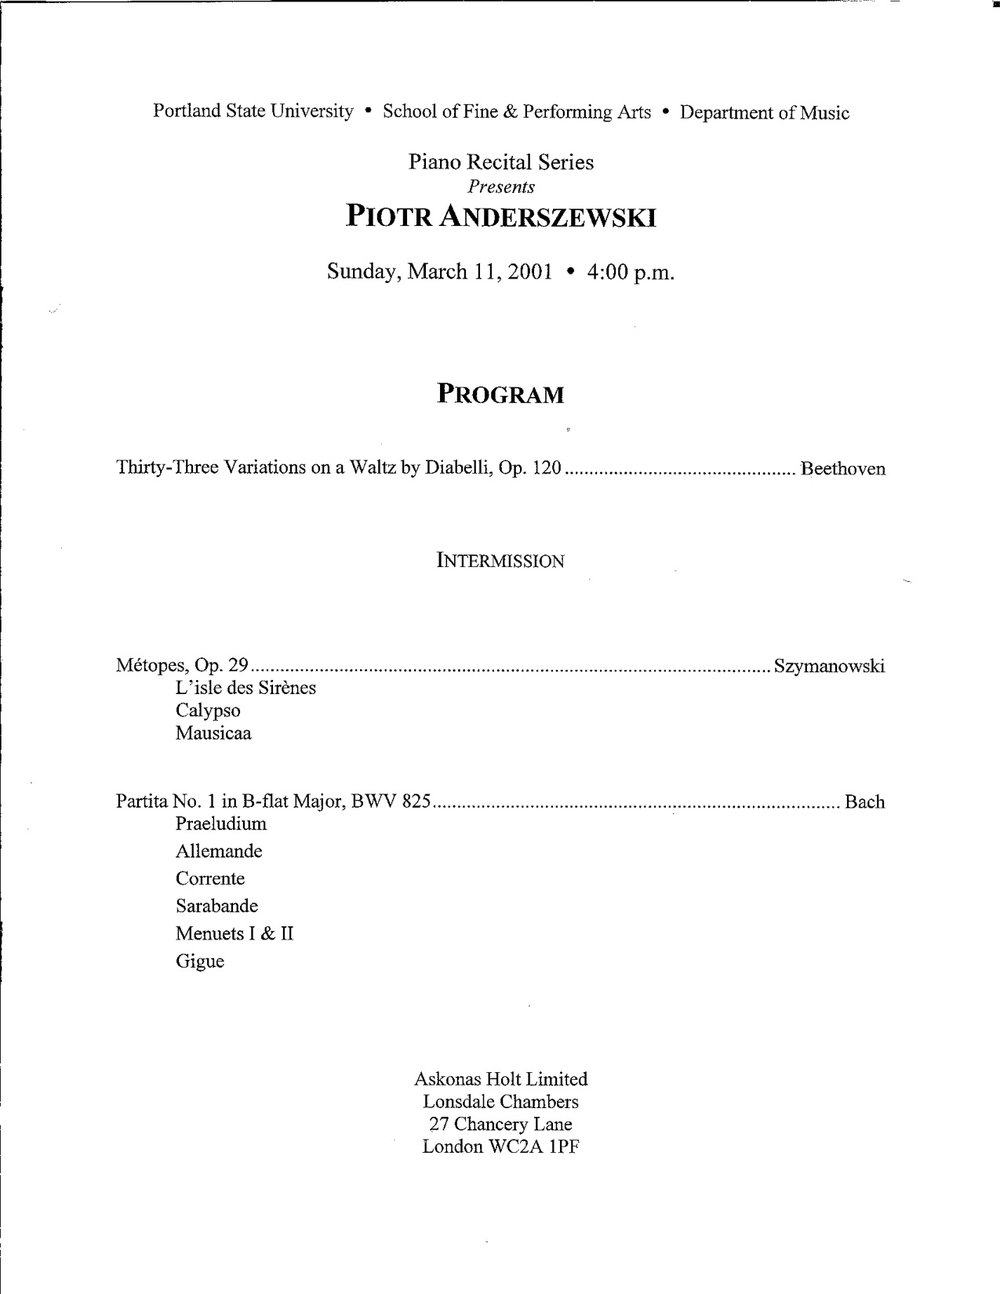 Anderszewski00-01_Program3.jpg